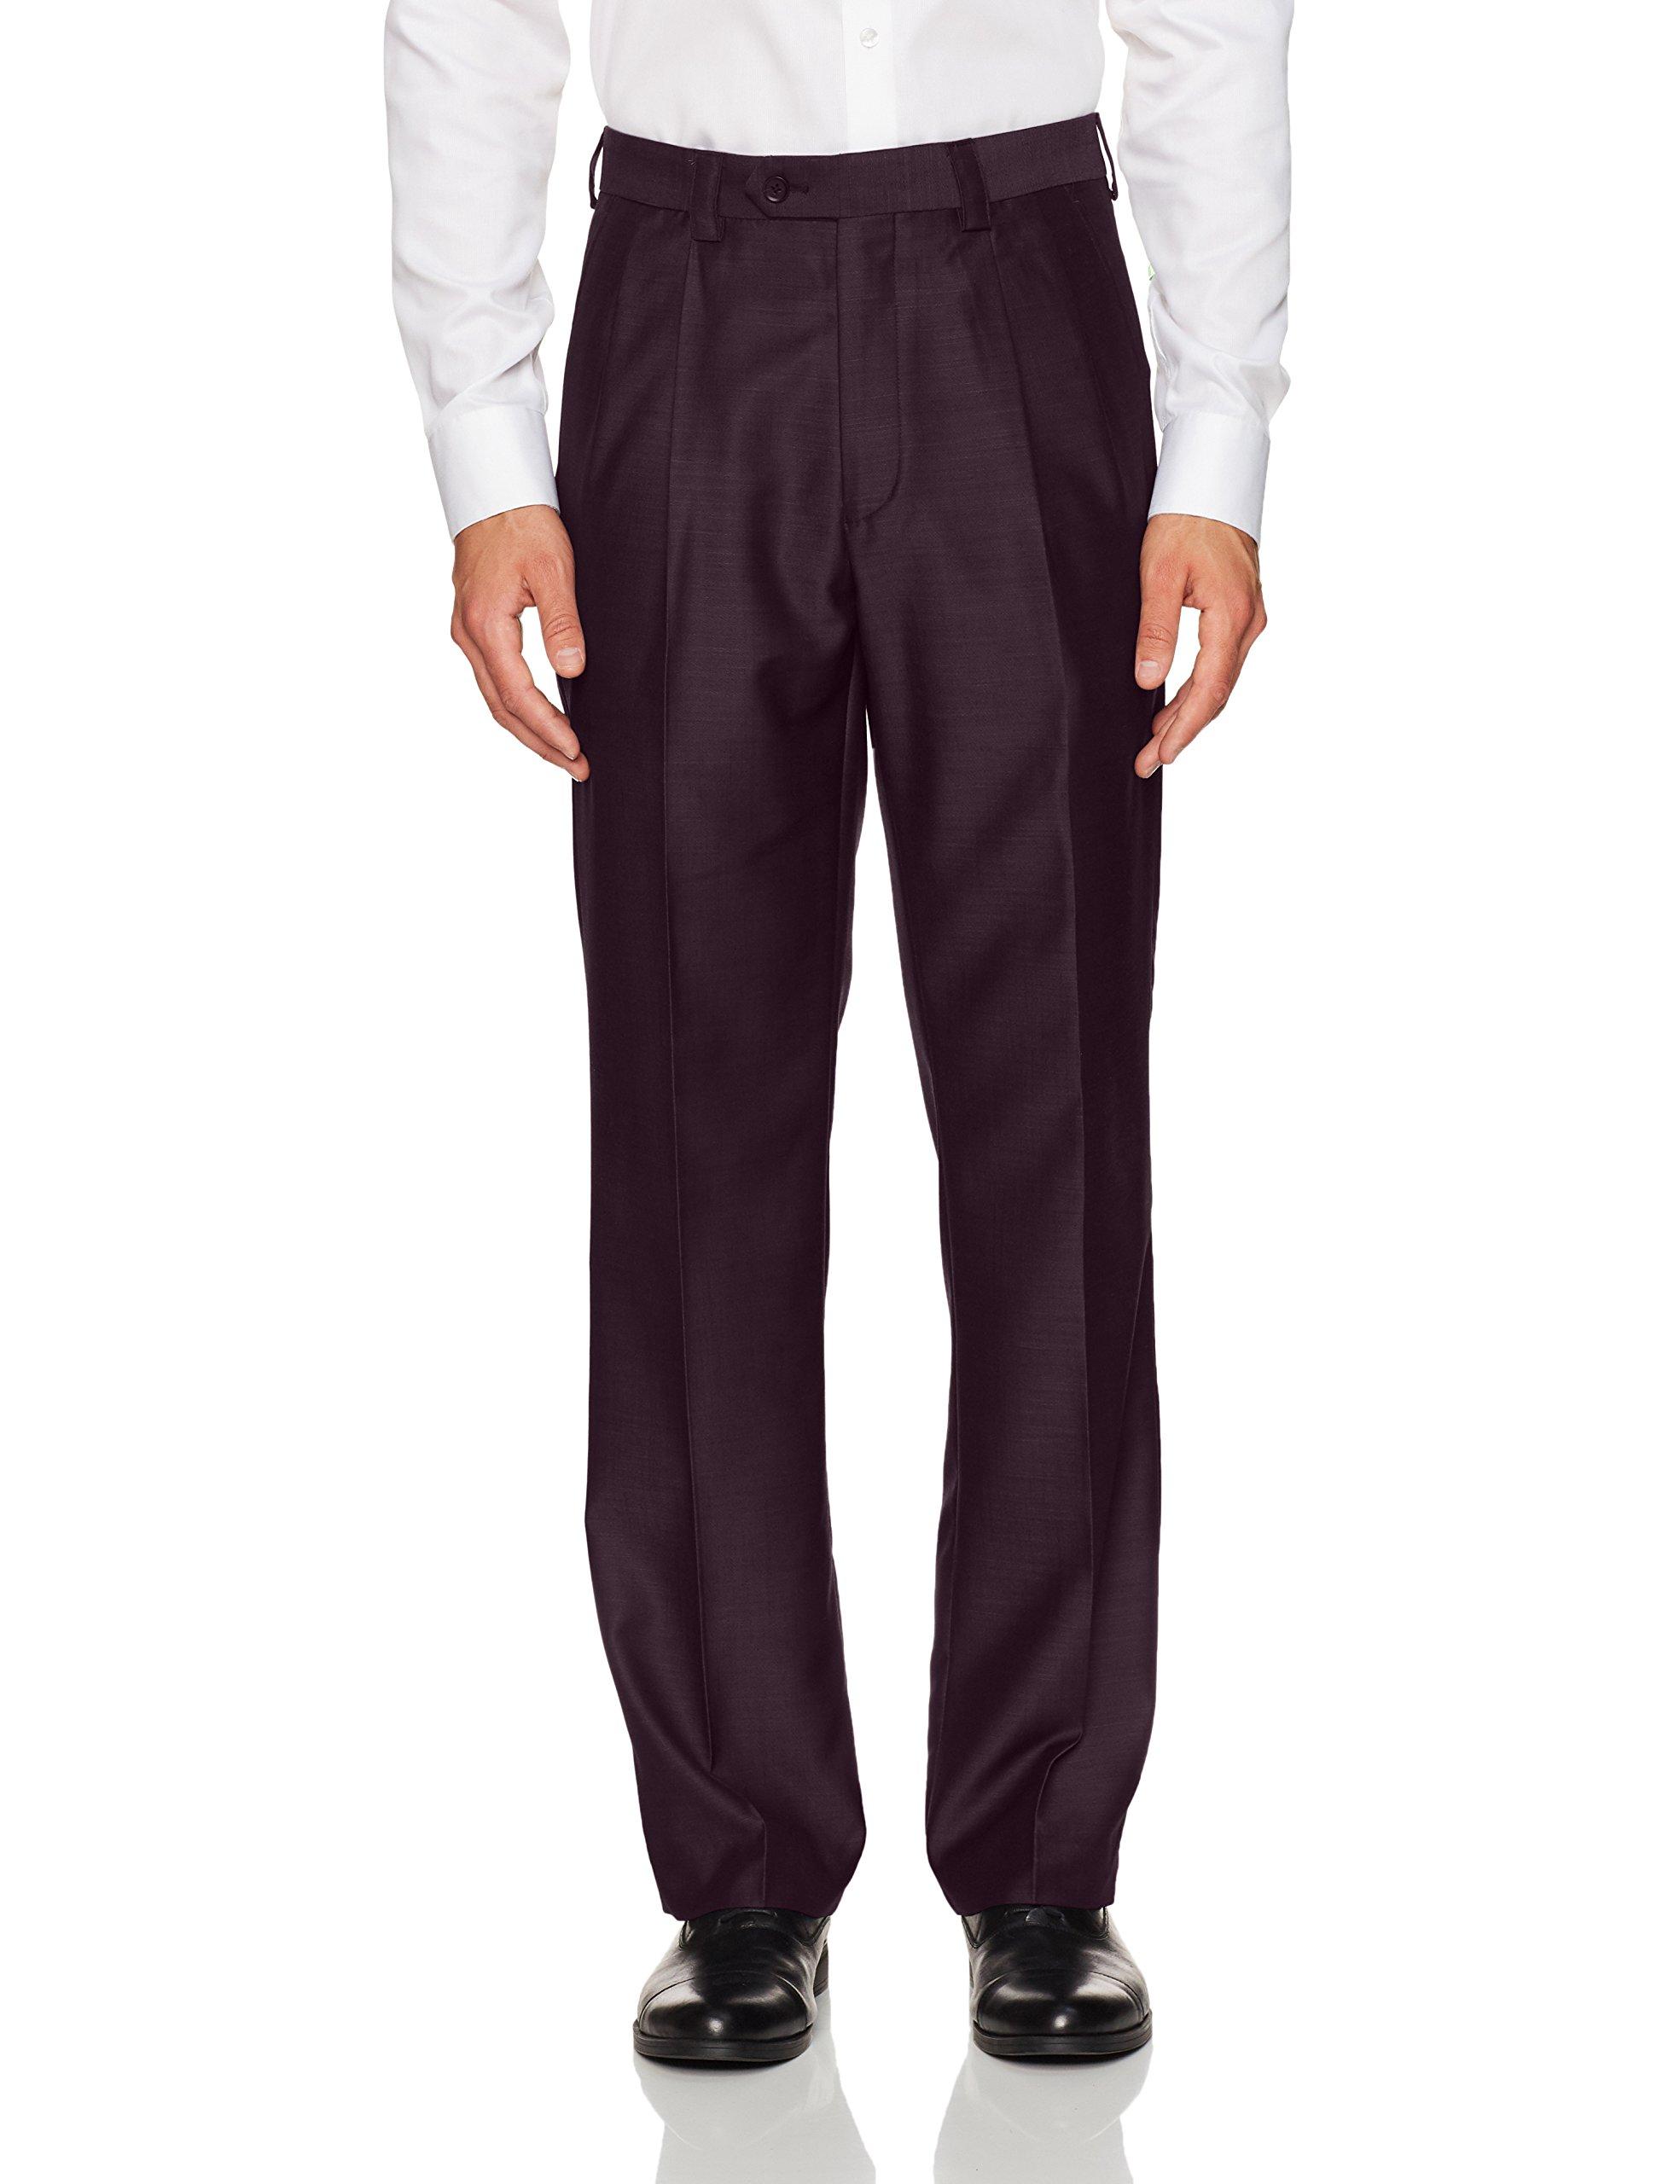 Steve Harvey Men's Solid Regular Fit Suit Seperate Pant, Merlot, 36Wx34L